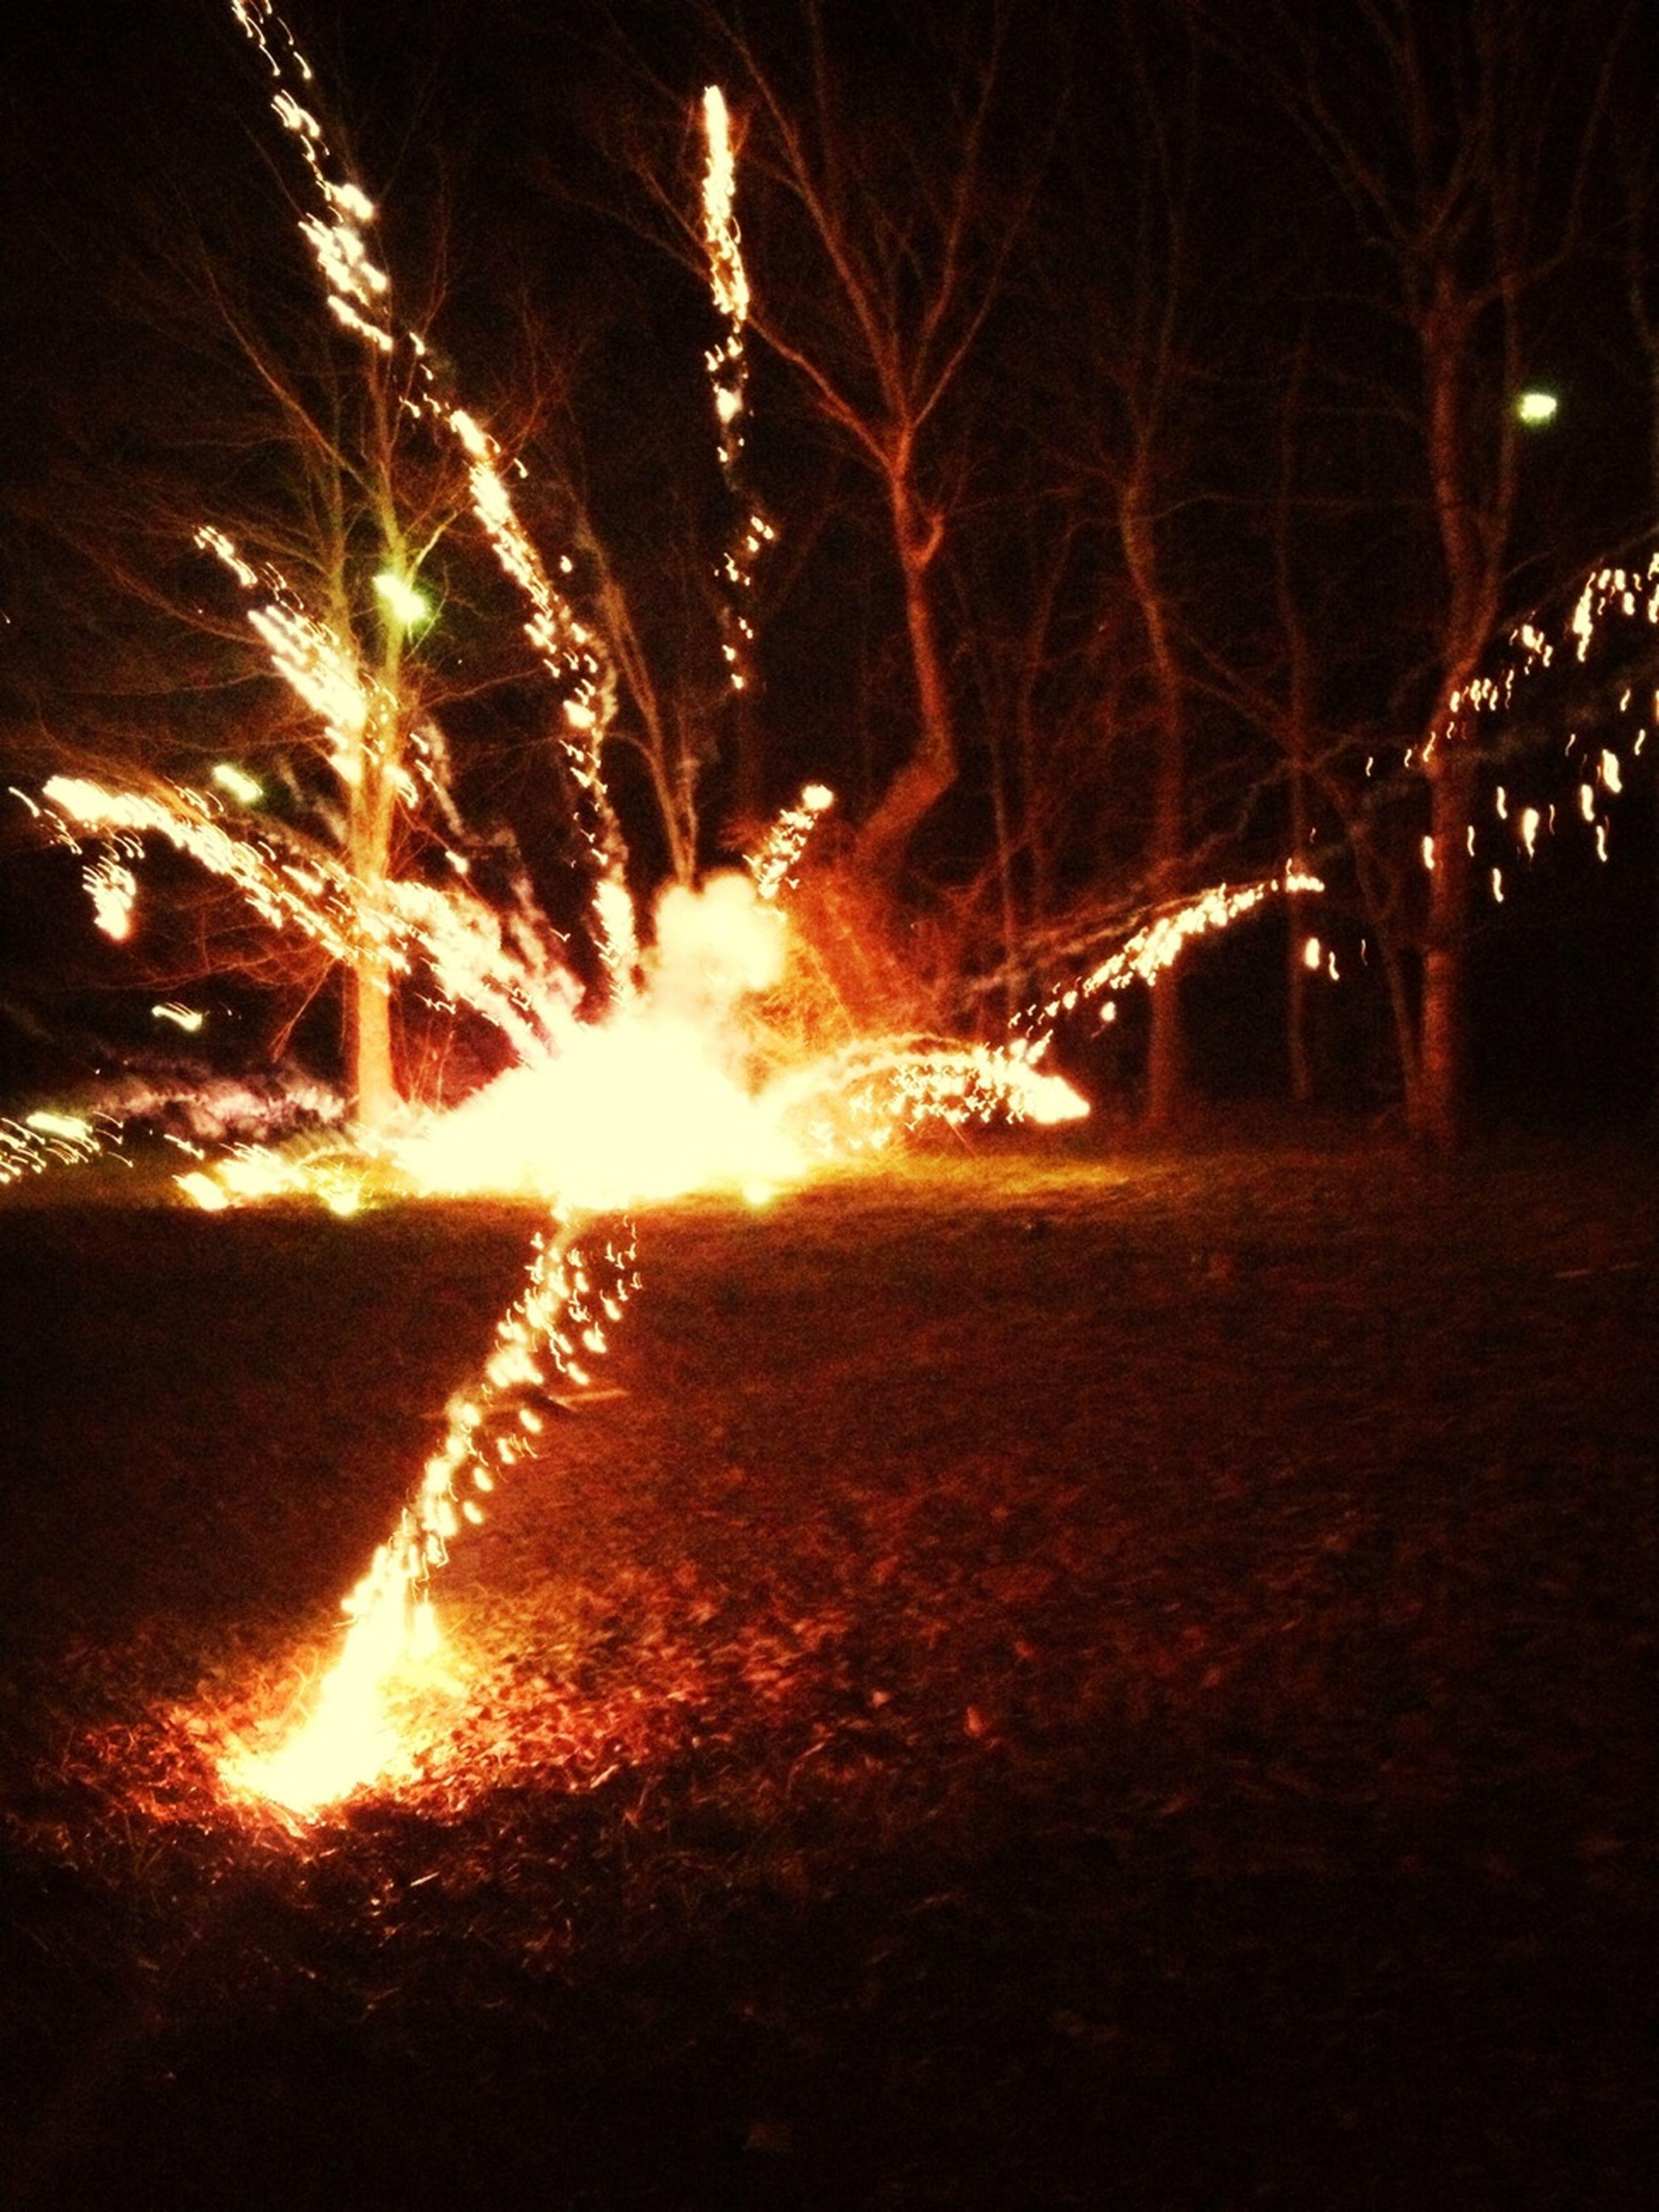 night, illuminated, glowing, long exposure, motion, fire - natural phenomenon, burning, light - natural phenomenon, dark, tree, firework display, outdoors, blurred motion, sparks, flame, exploding, celebration, no people, sky, orange color